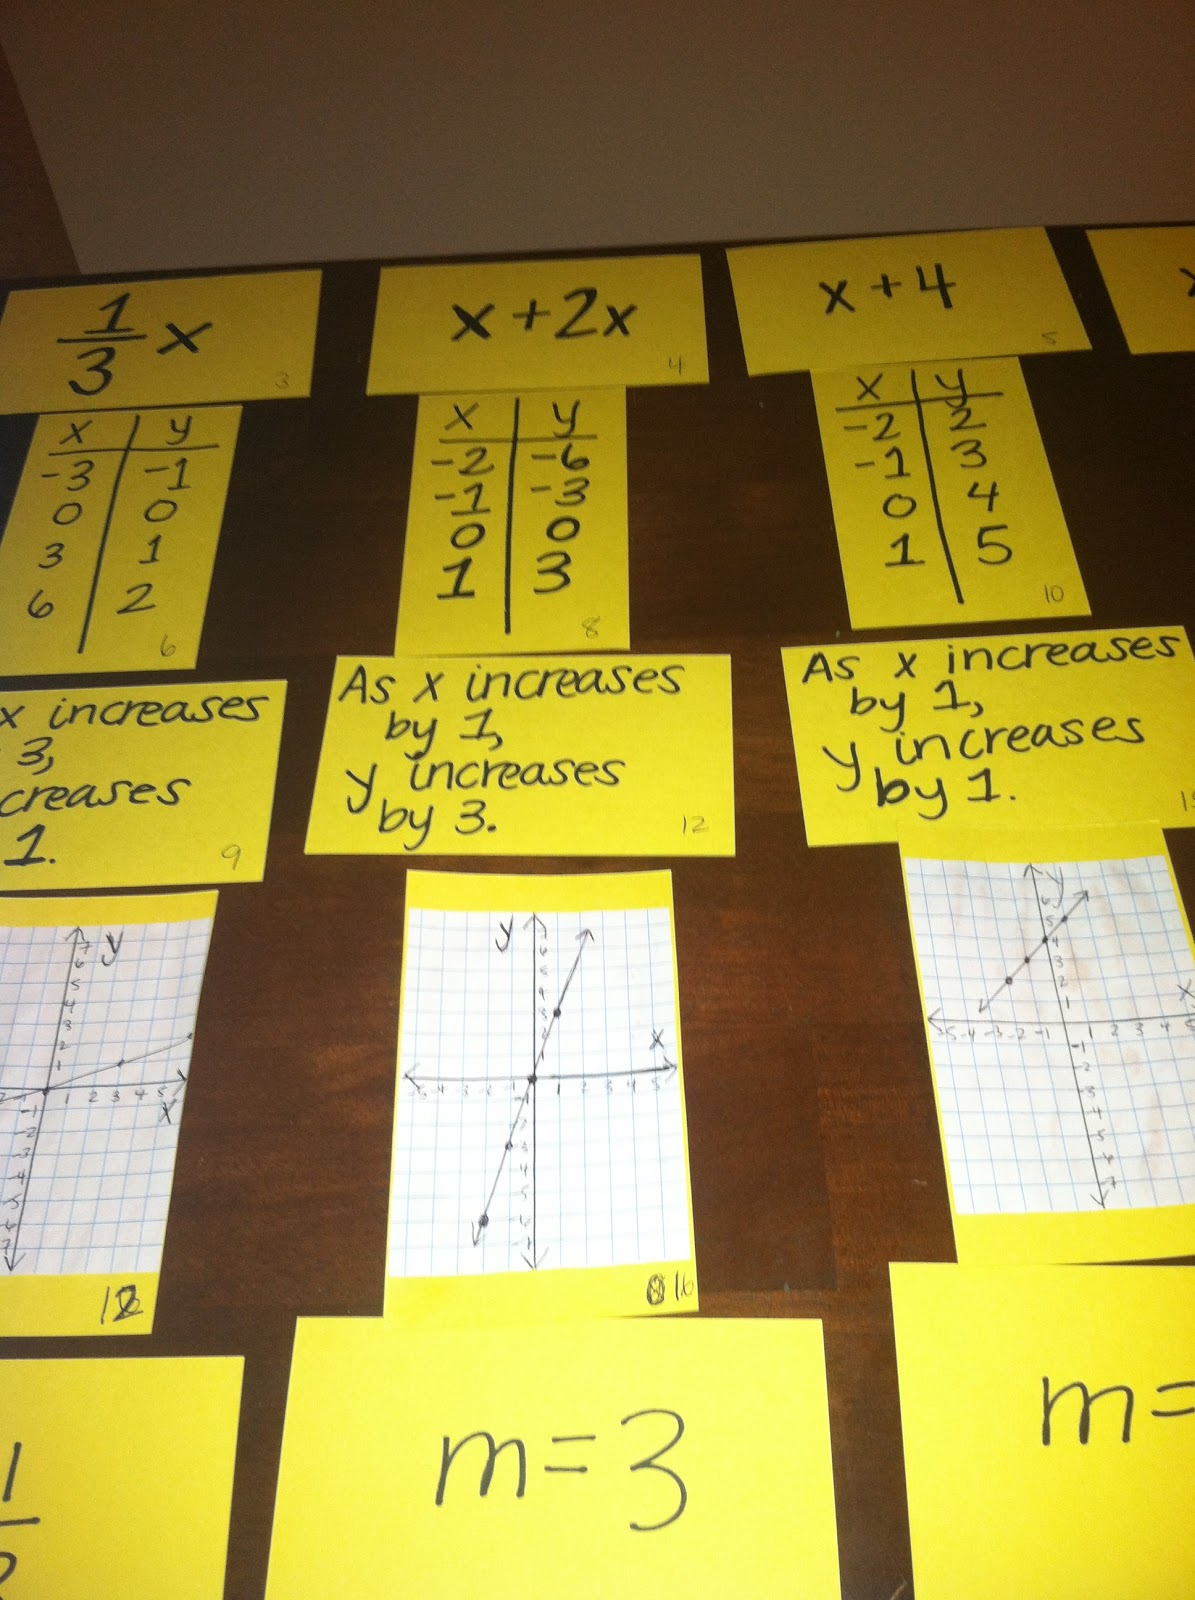 worksheet Slope As A Rate Of Change Worksheet mathiness is happiness rate of change happiness